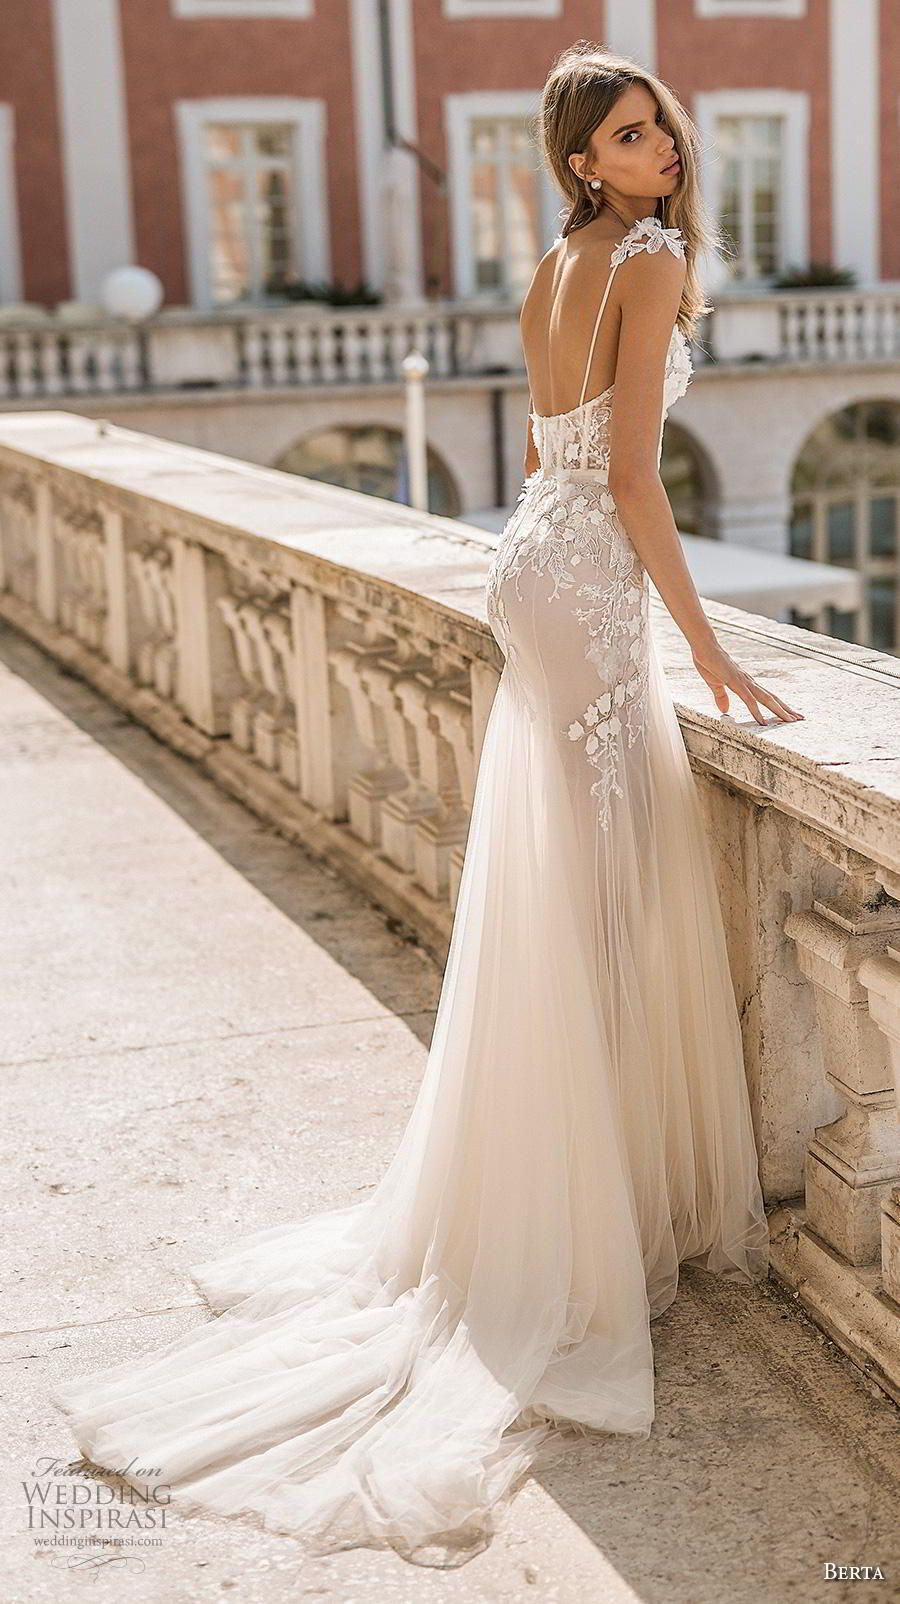 Berta Privée 2019 Wedding Dresses #bertaweddingdress